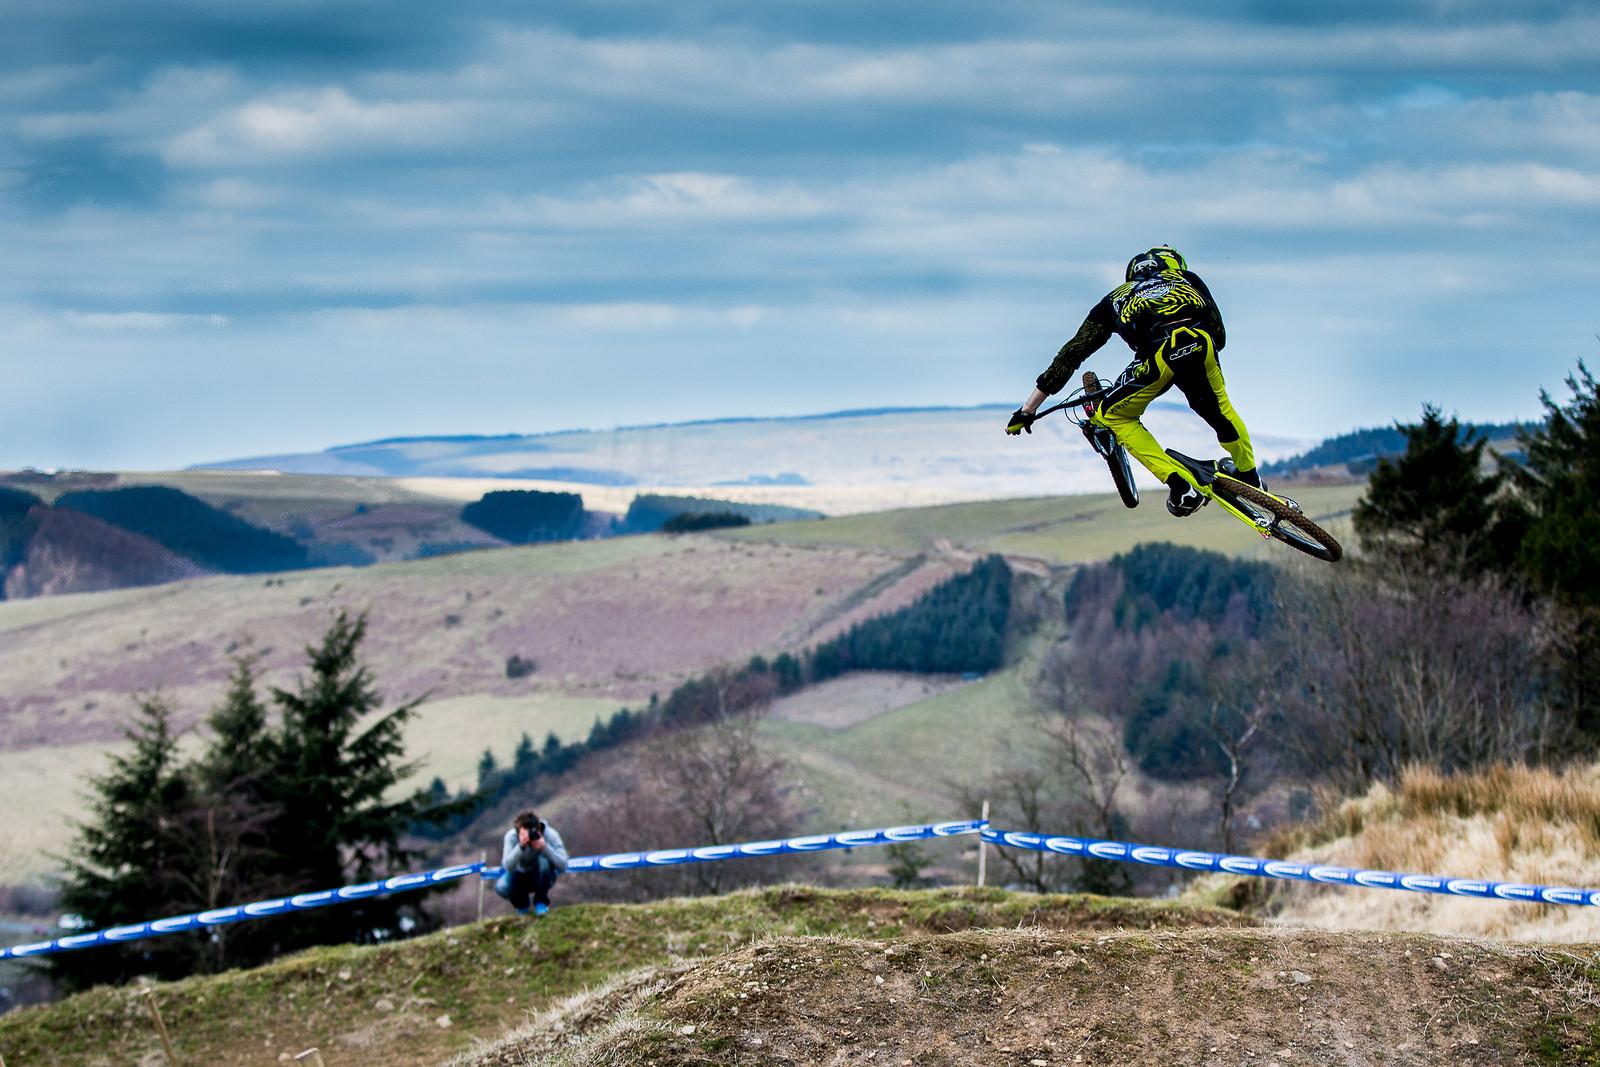 Jordan 'whippy' Lunn - Wayne DC - Mountain Biking Pictures - Vital MTB